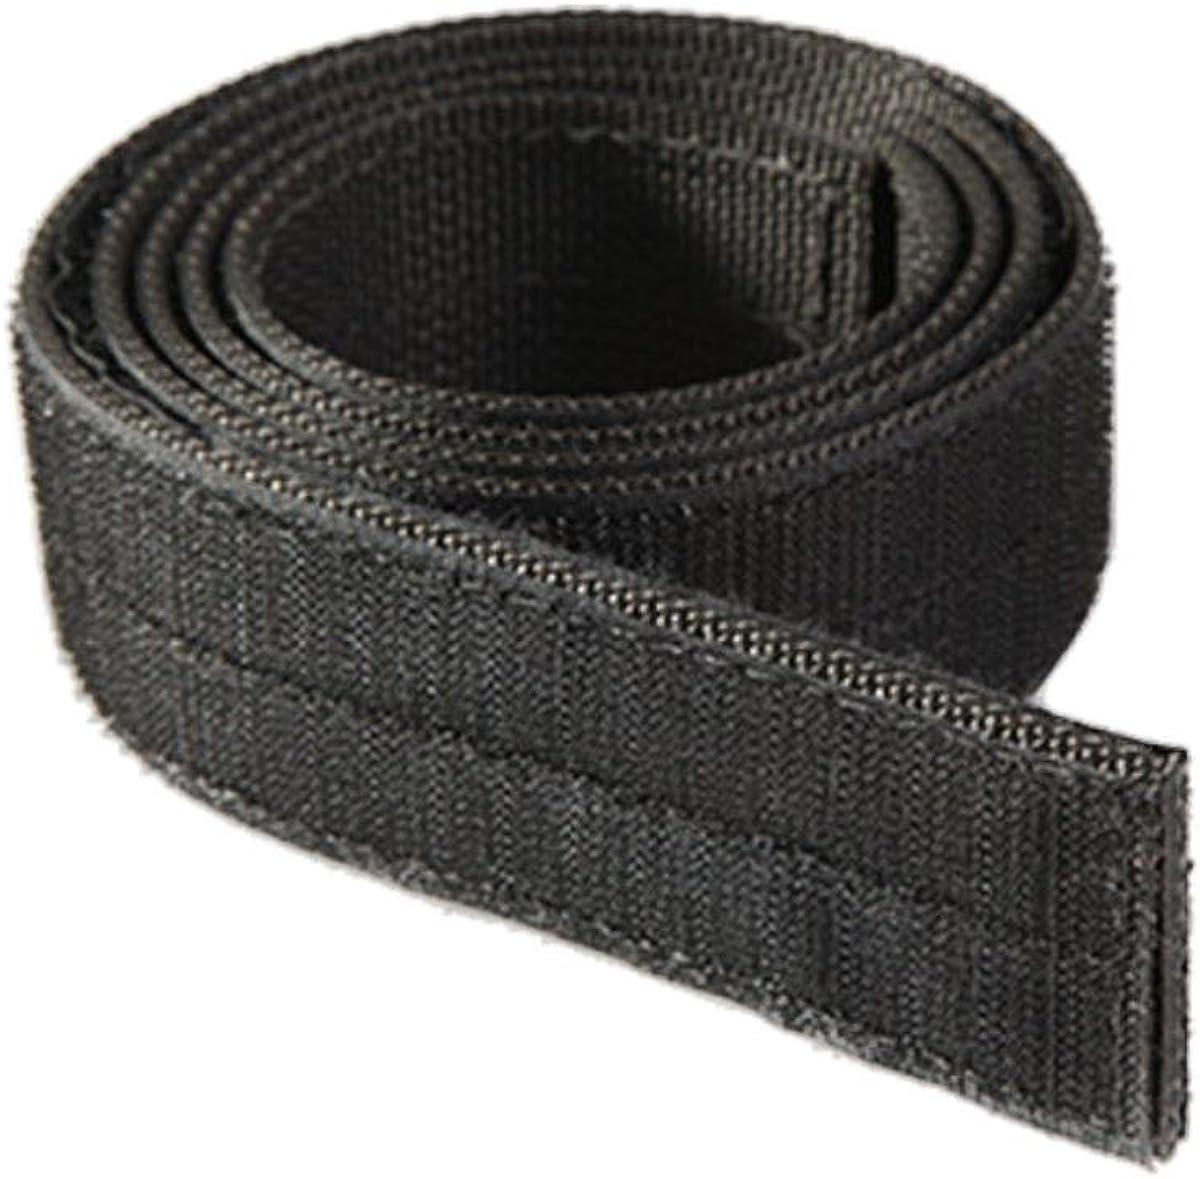 High Speed Gear Velcro Inner Duty Belt, Made in the USA, Black, Large 36-40